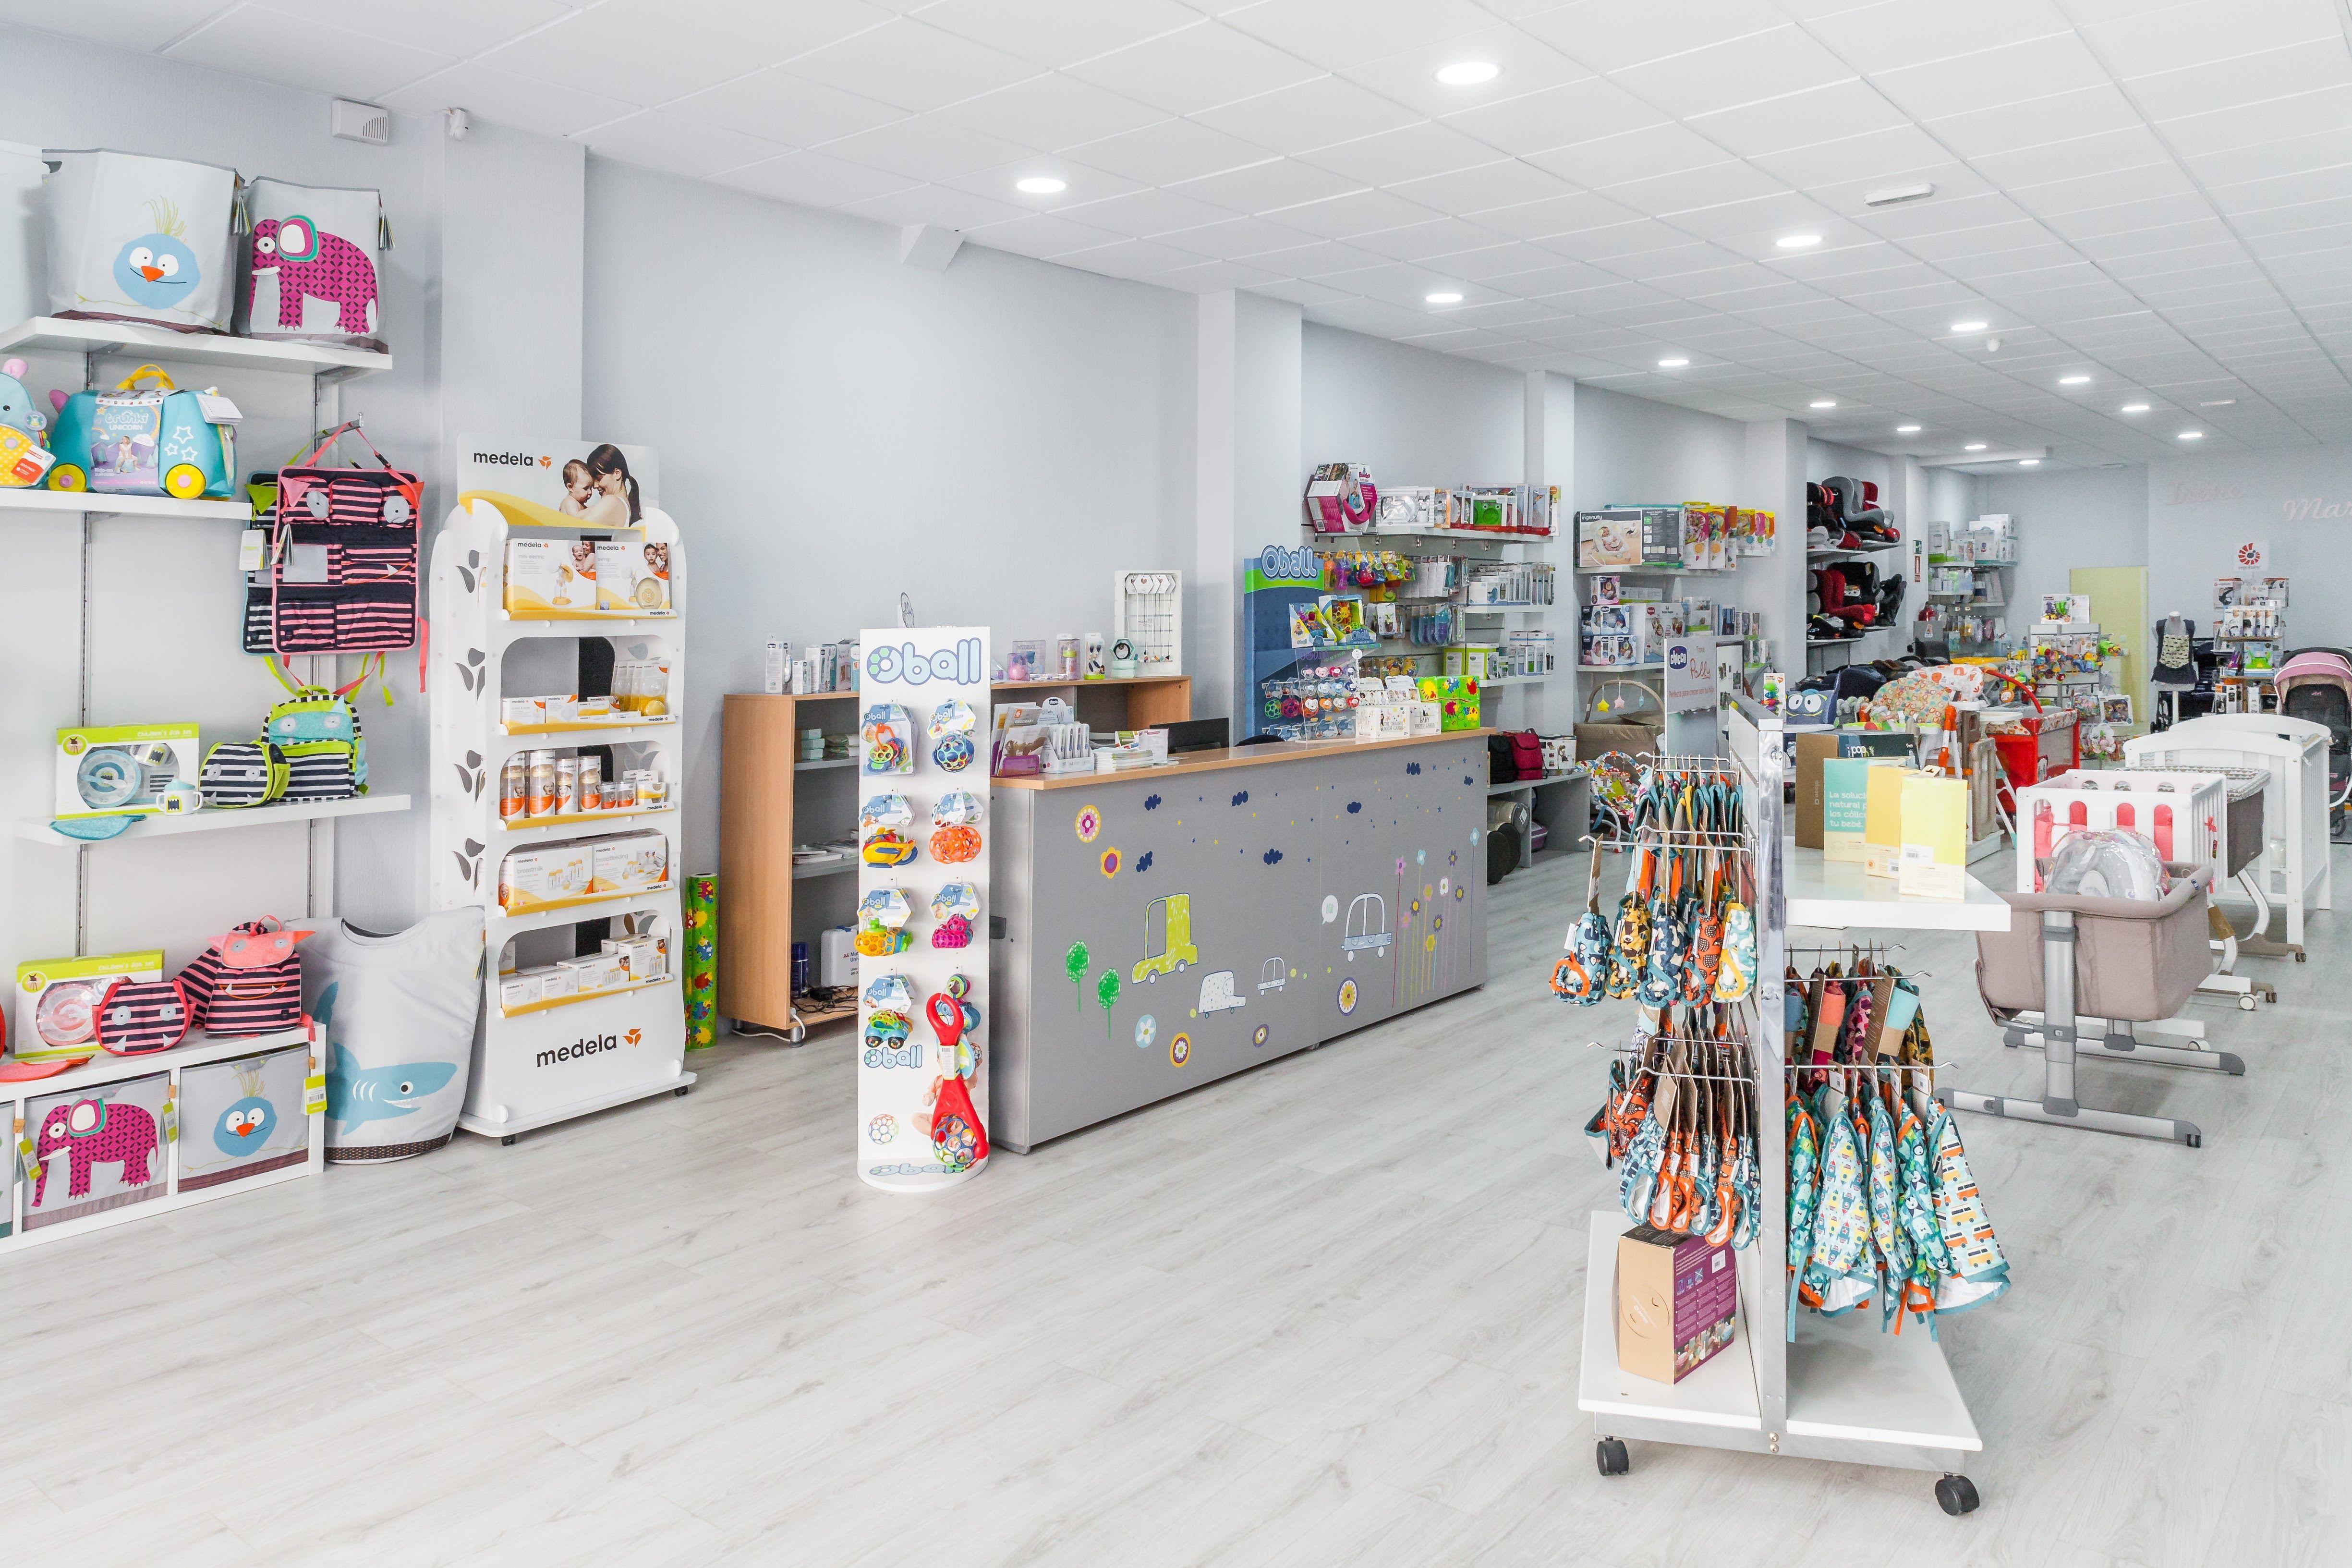 8eb0040c6 Tiendas de ropa de bebé en Tenerife  Innova Kids